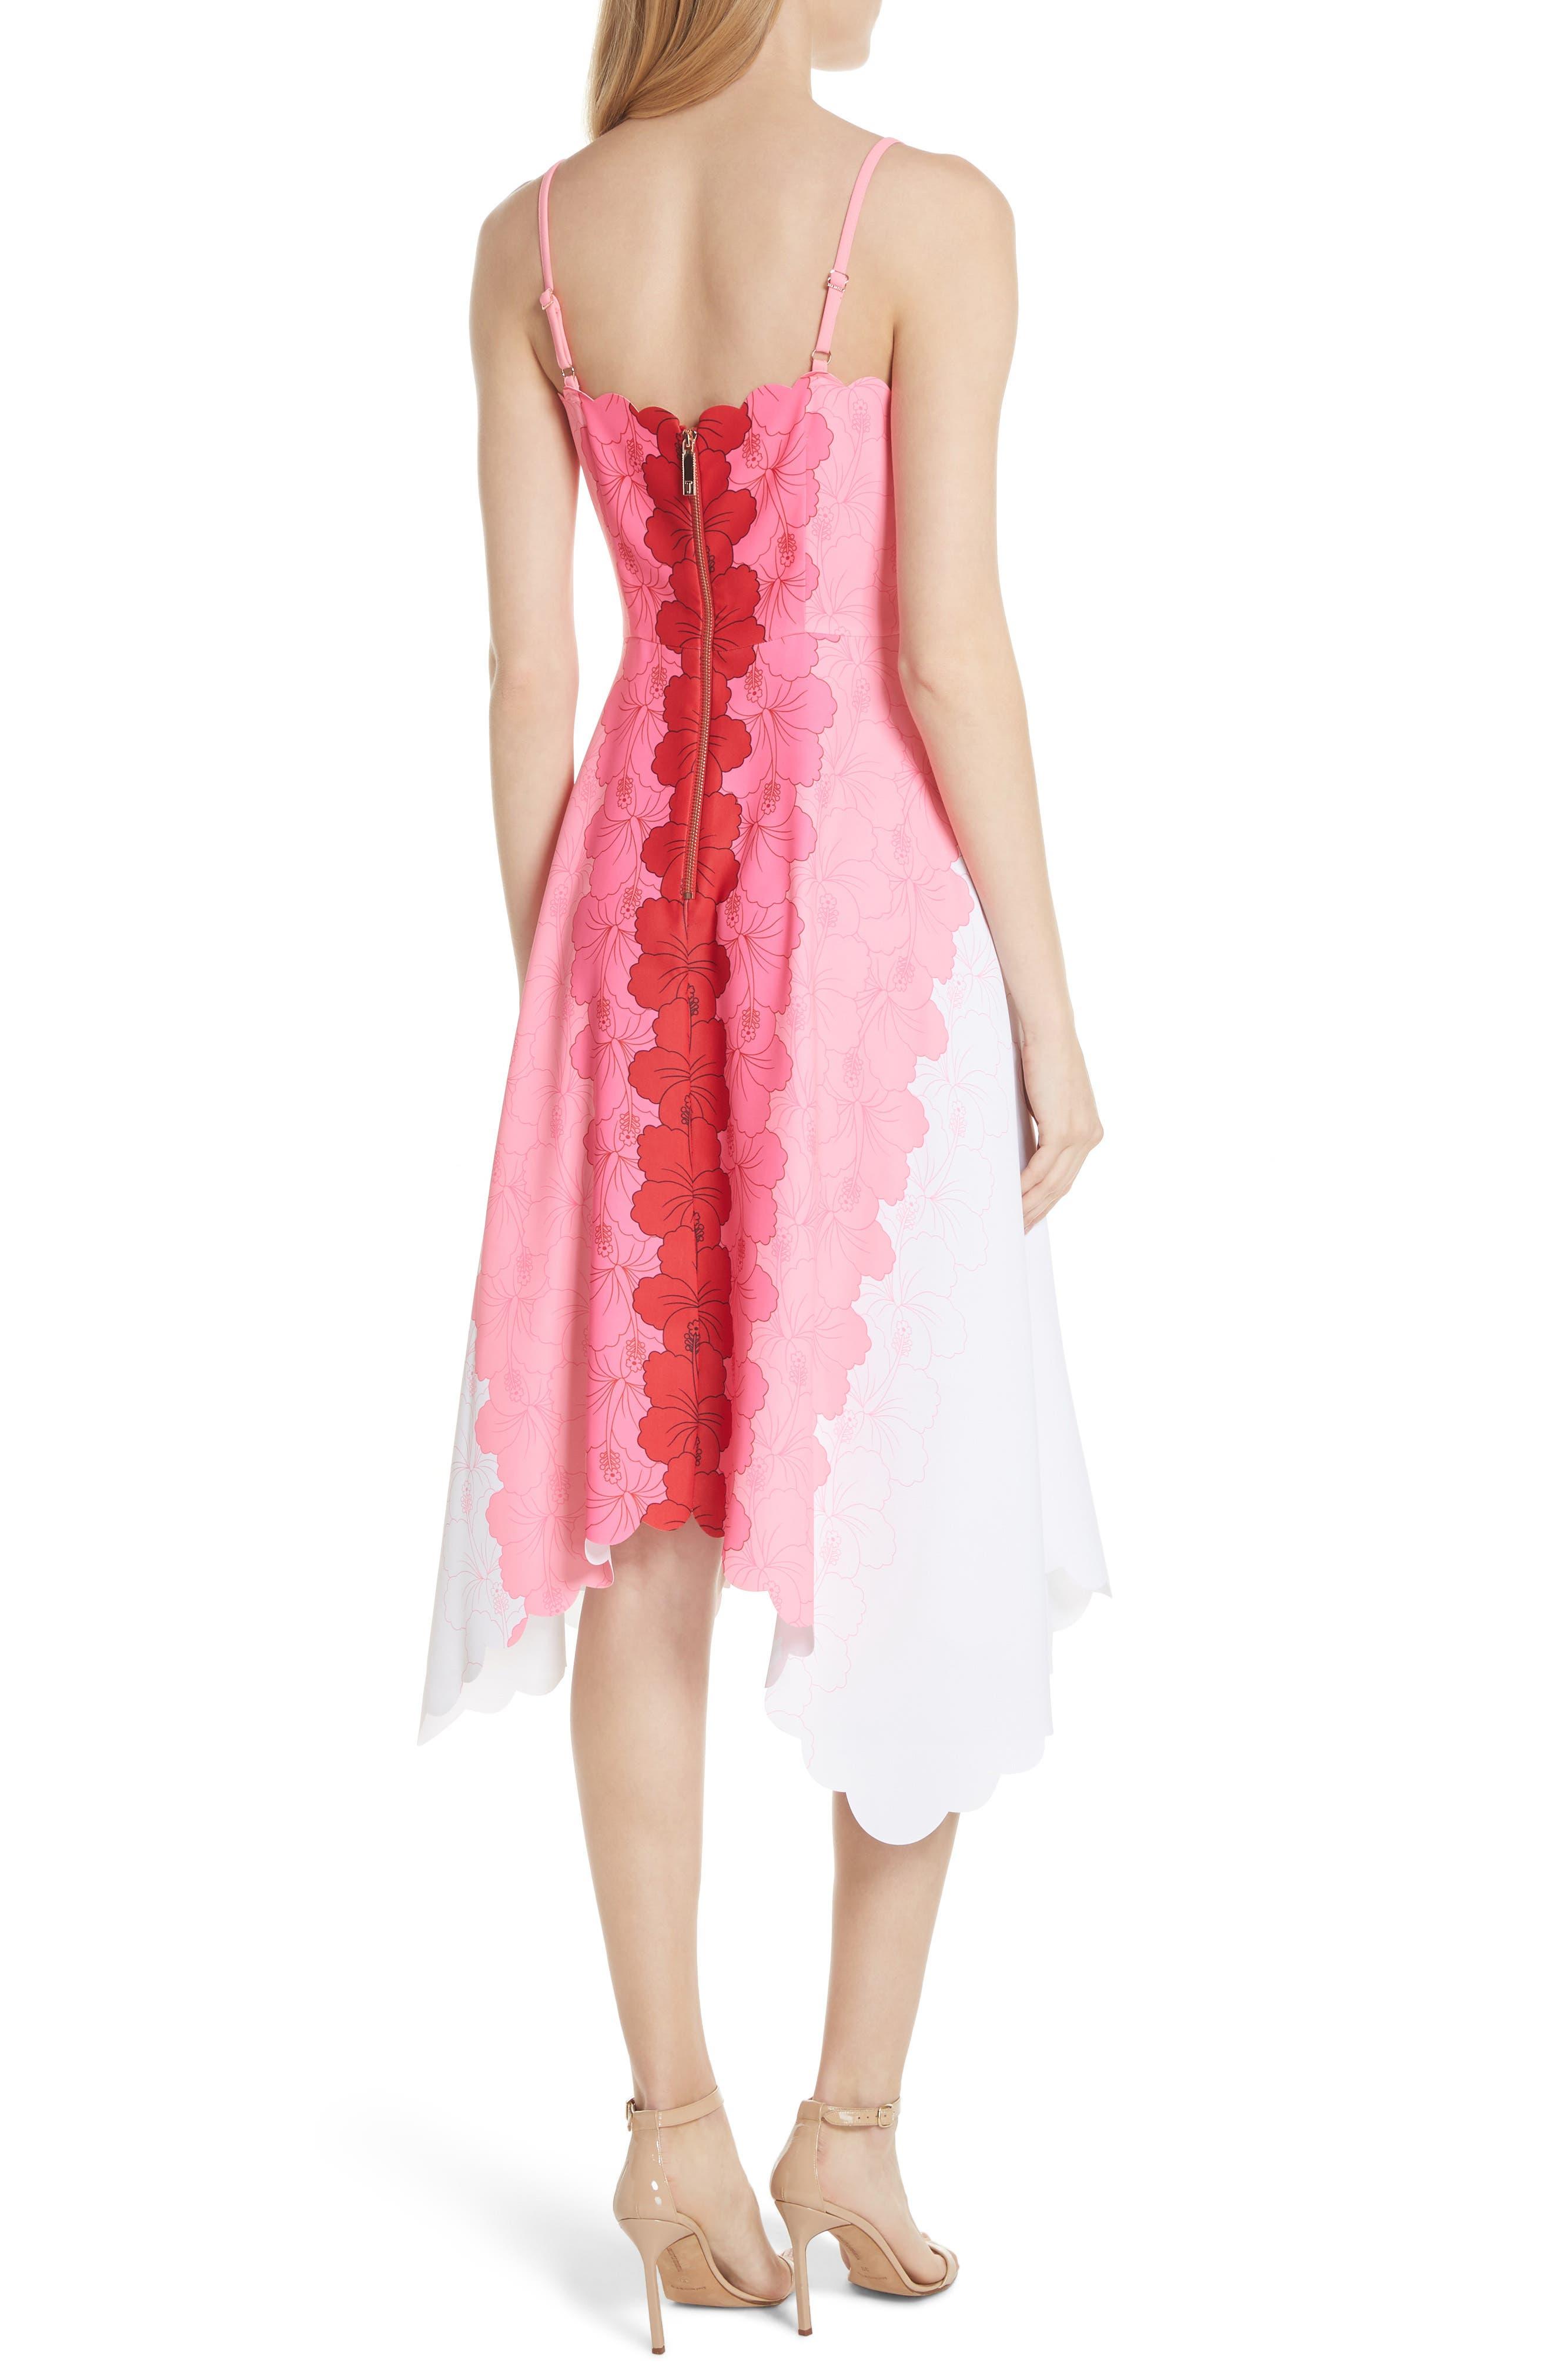 Ritsa Happiness Dress,                             Alternate thumbnail 2, color,                             671